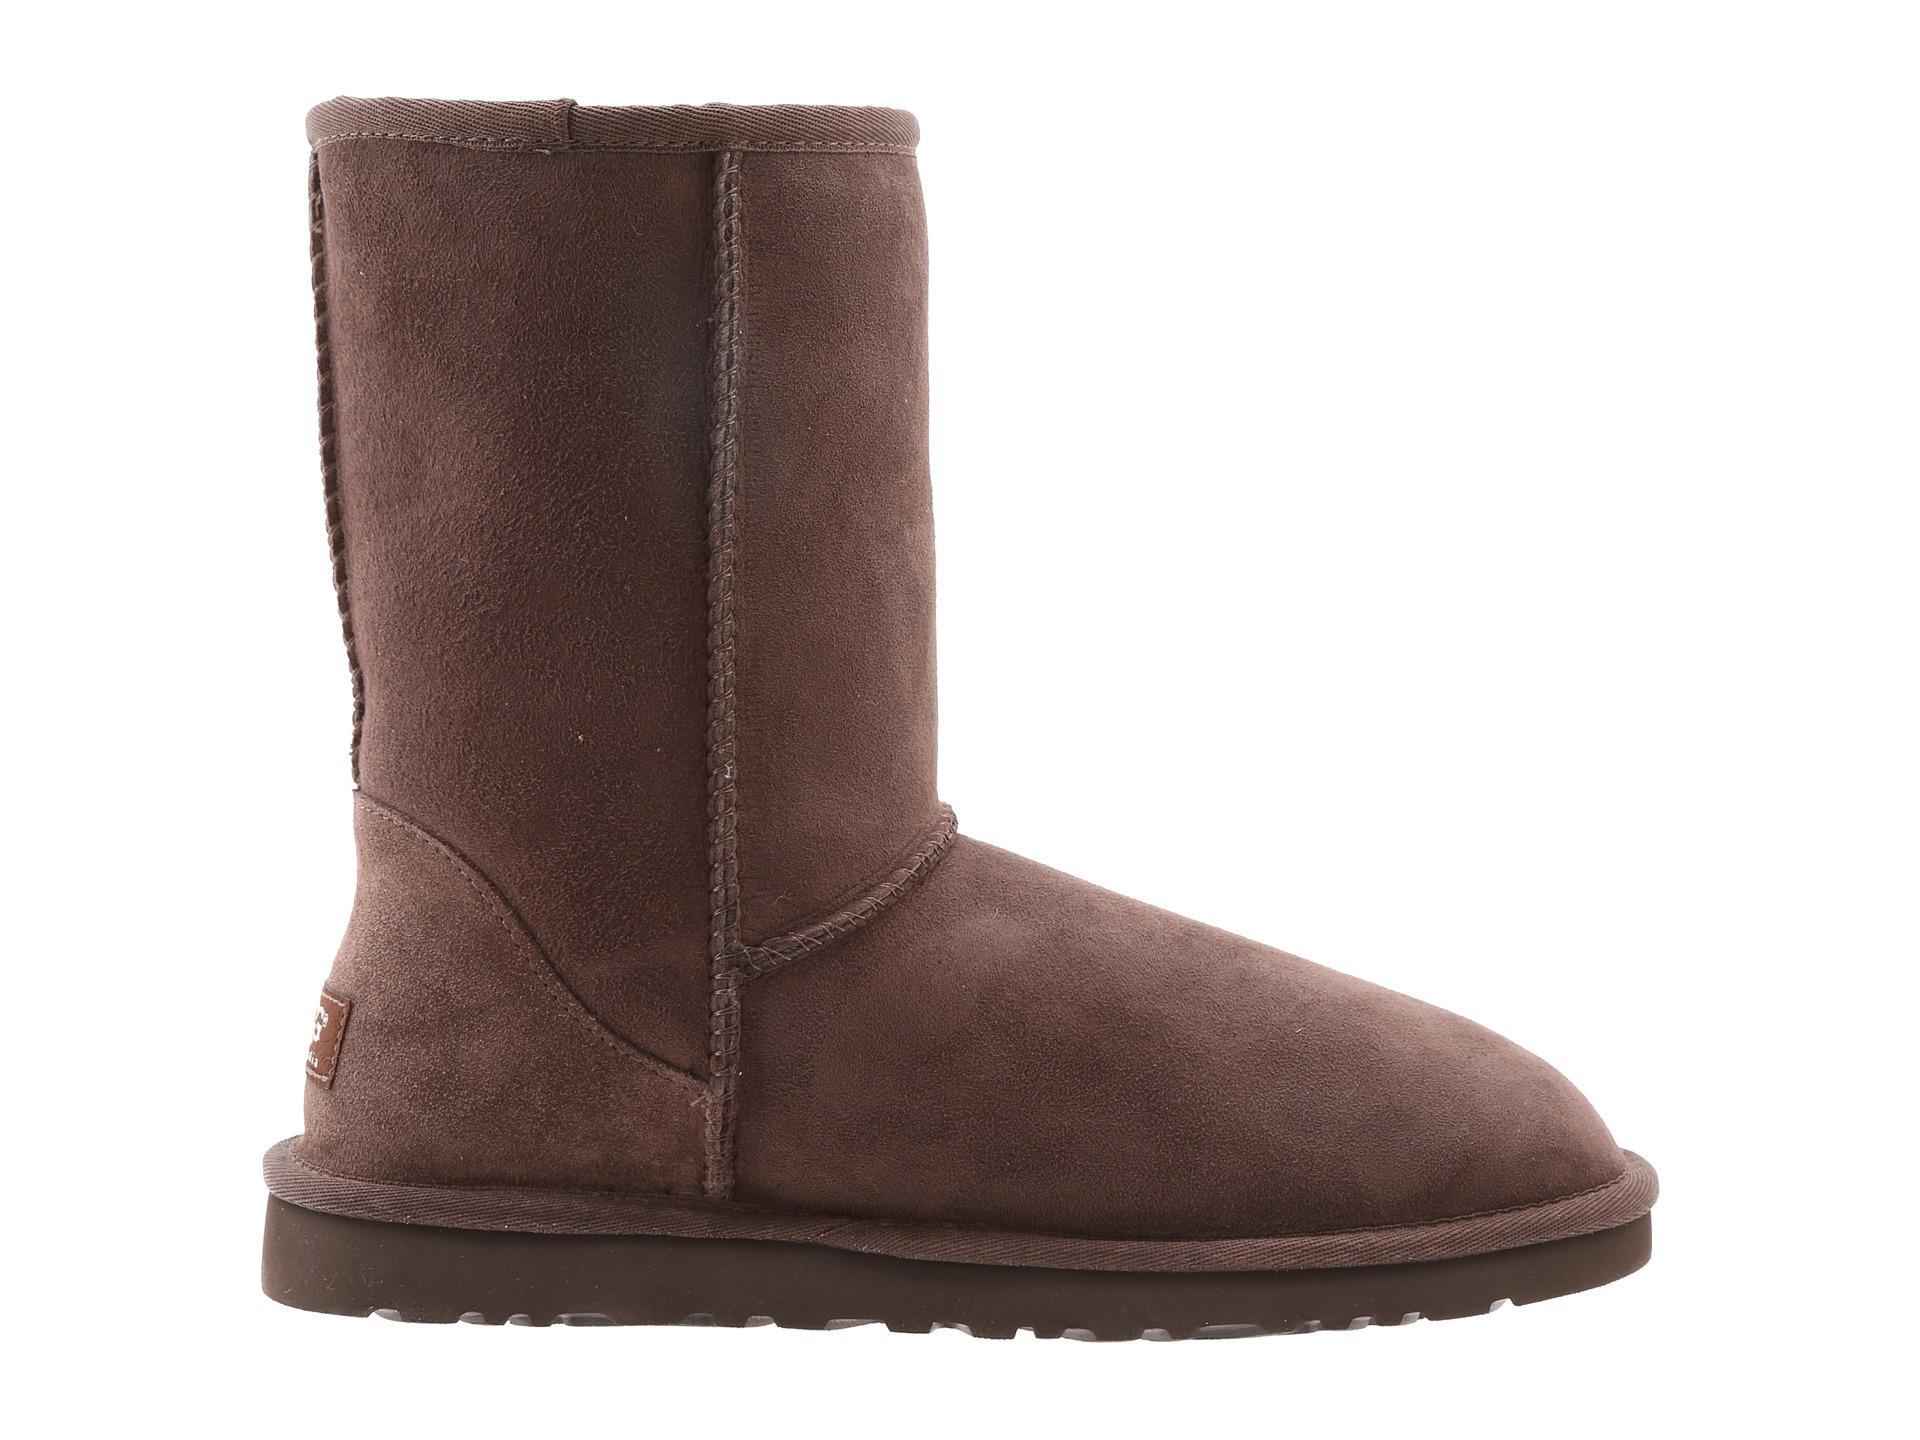 df26d291997 Snug Australia Ugg Boots Fake